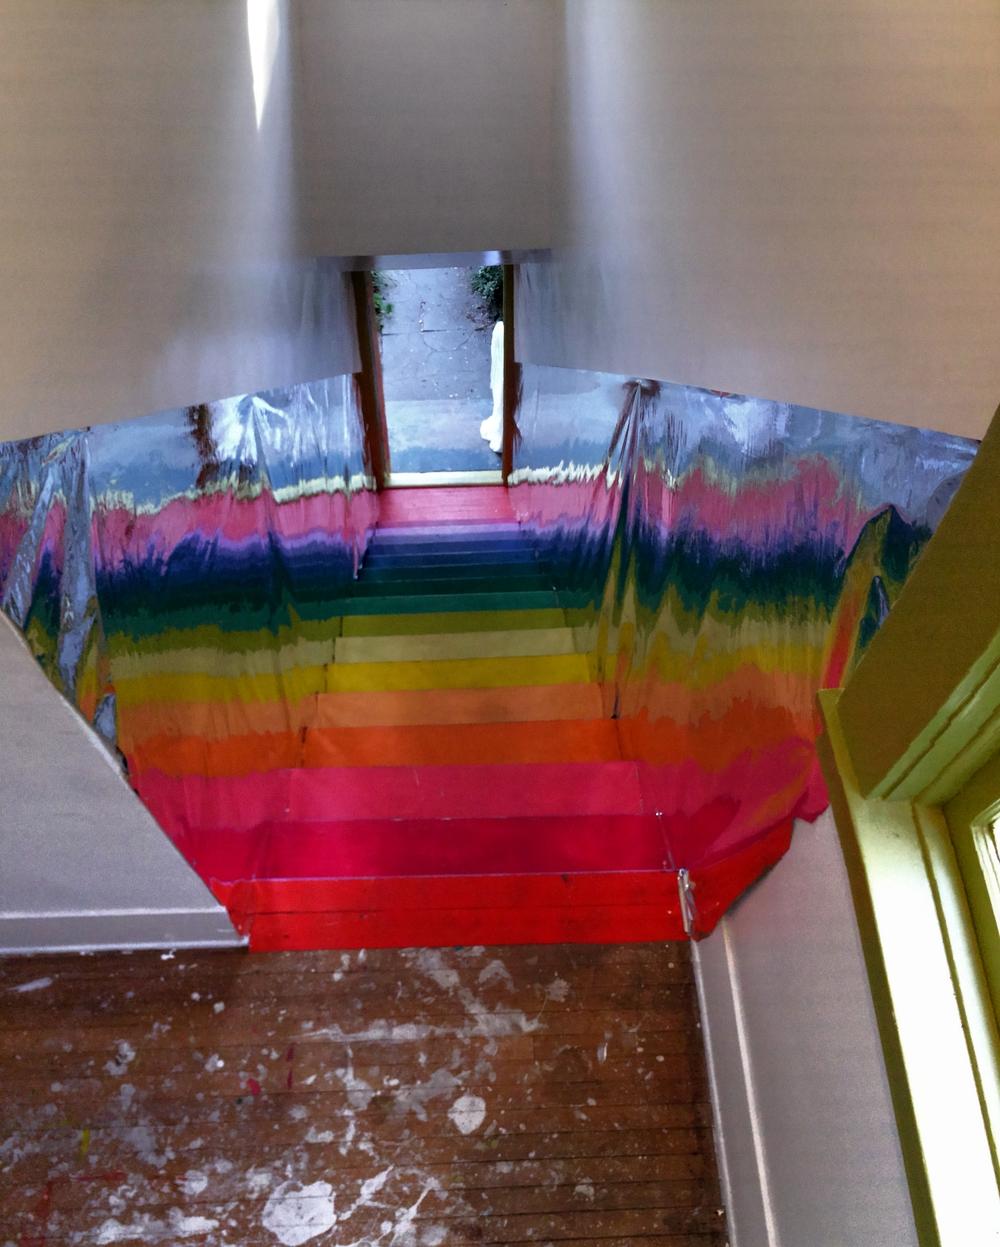 AFTER: Rainbow rabbit-hole